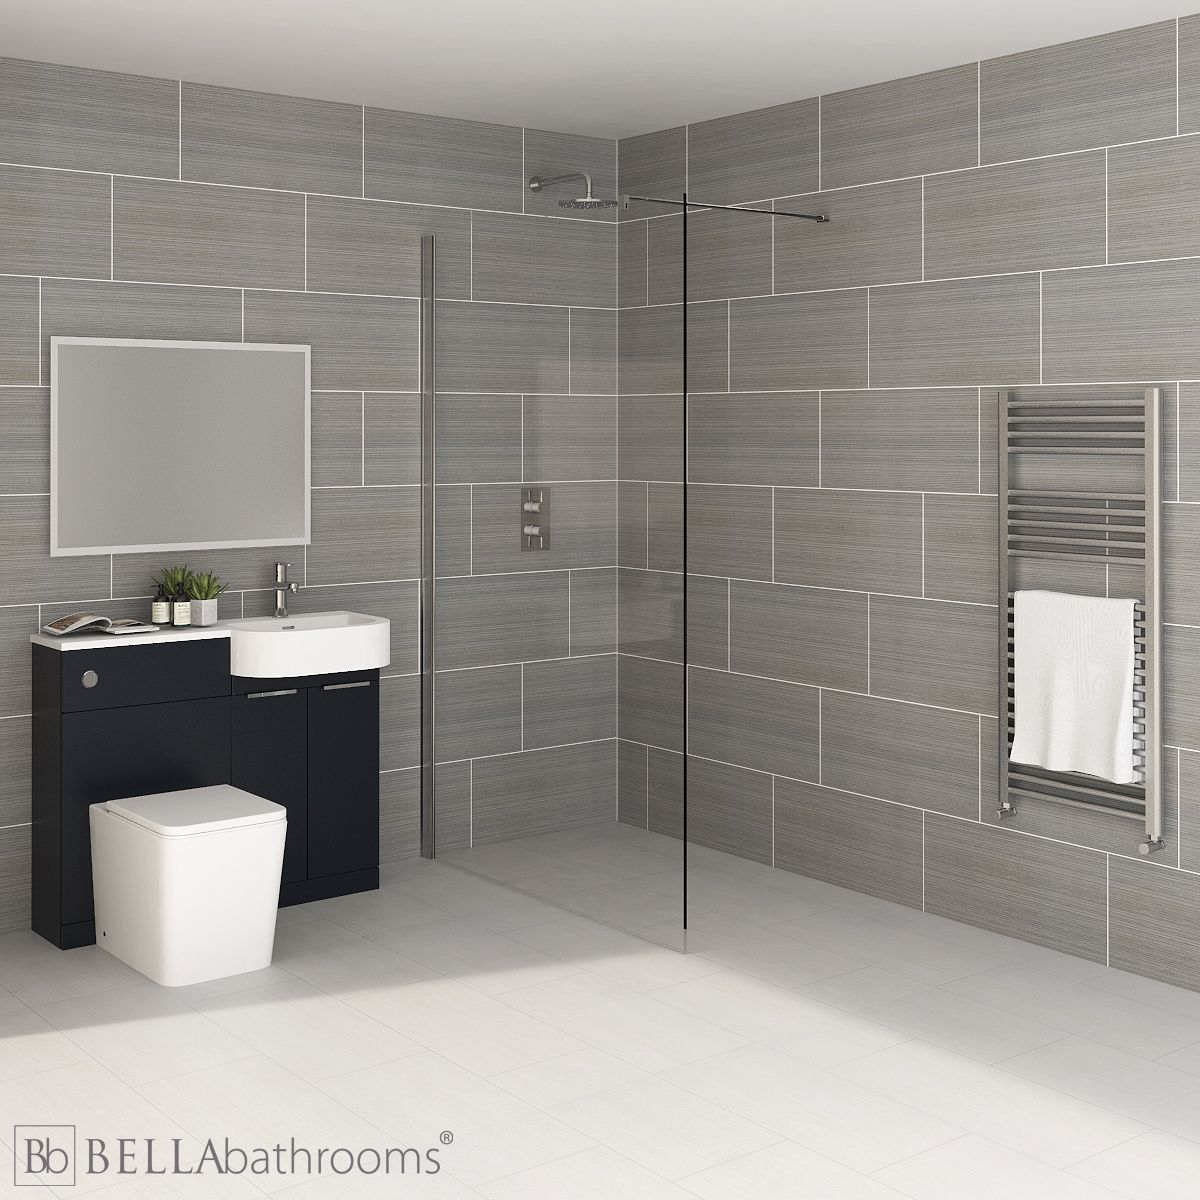 Elation Combination P Shape Indigo Matt Furniture Suite with April Destini Wet Room Shower Enclosure with Brearton Toilet